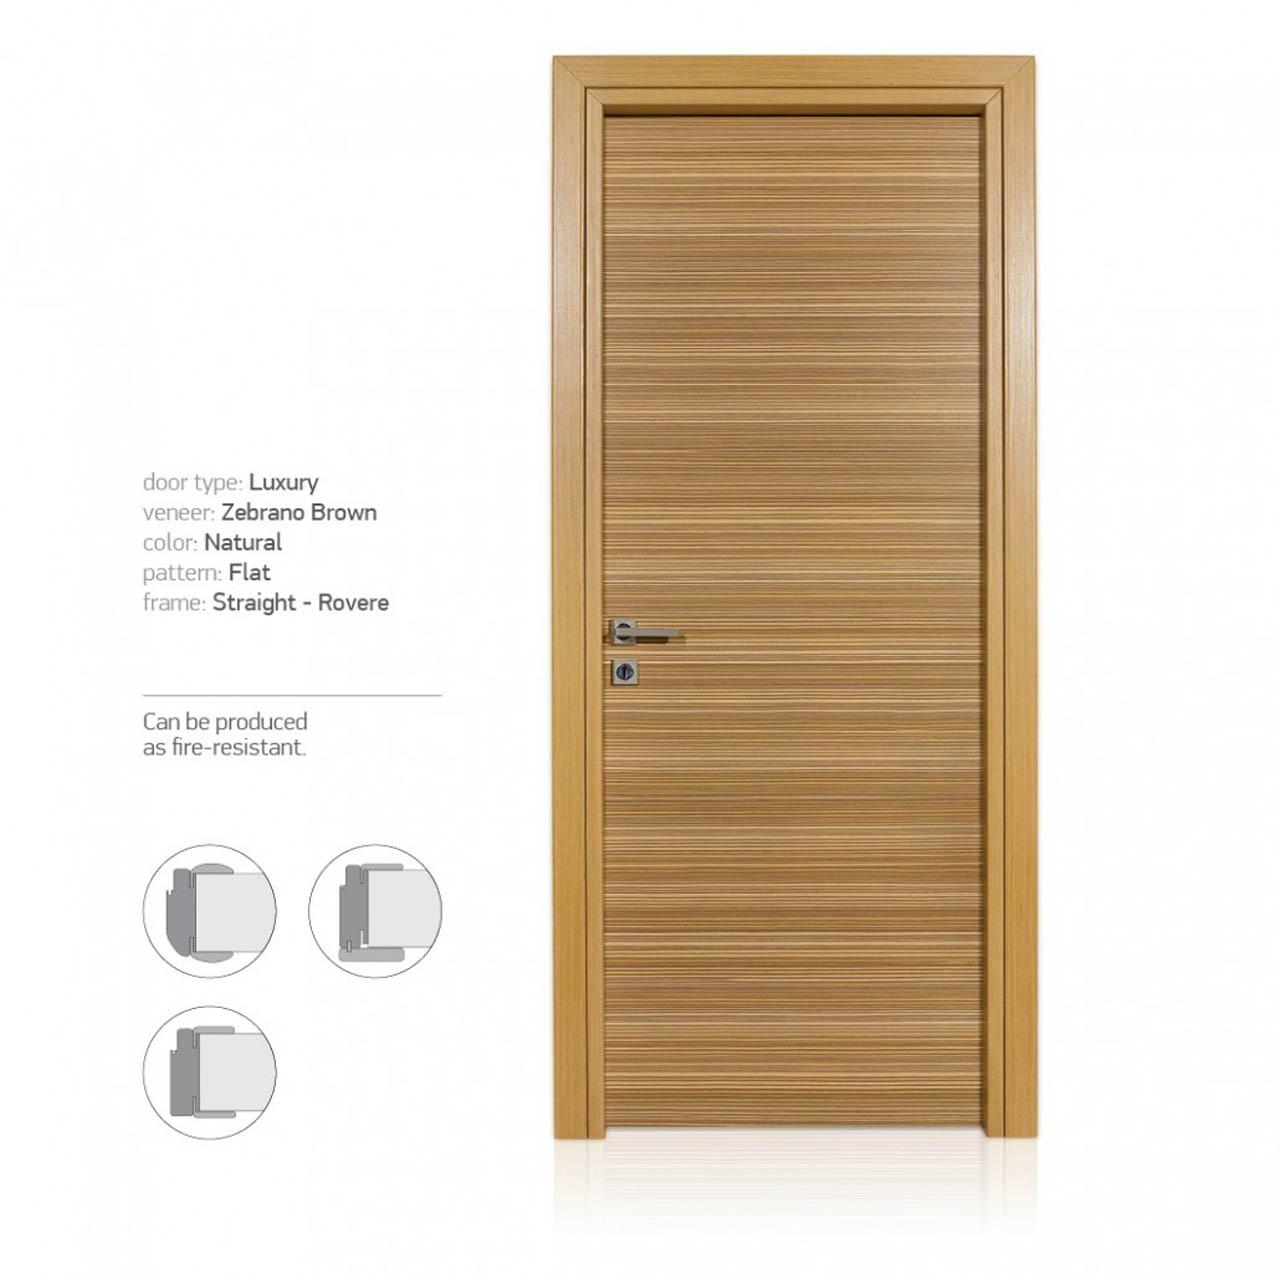 portes-site-luxury-eng8-1030x1030